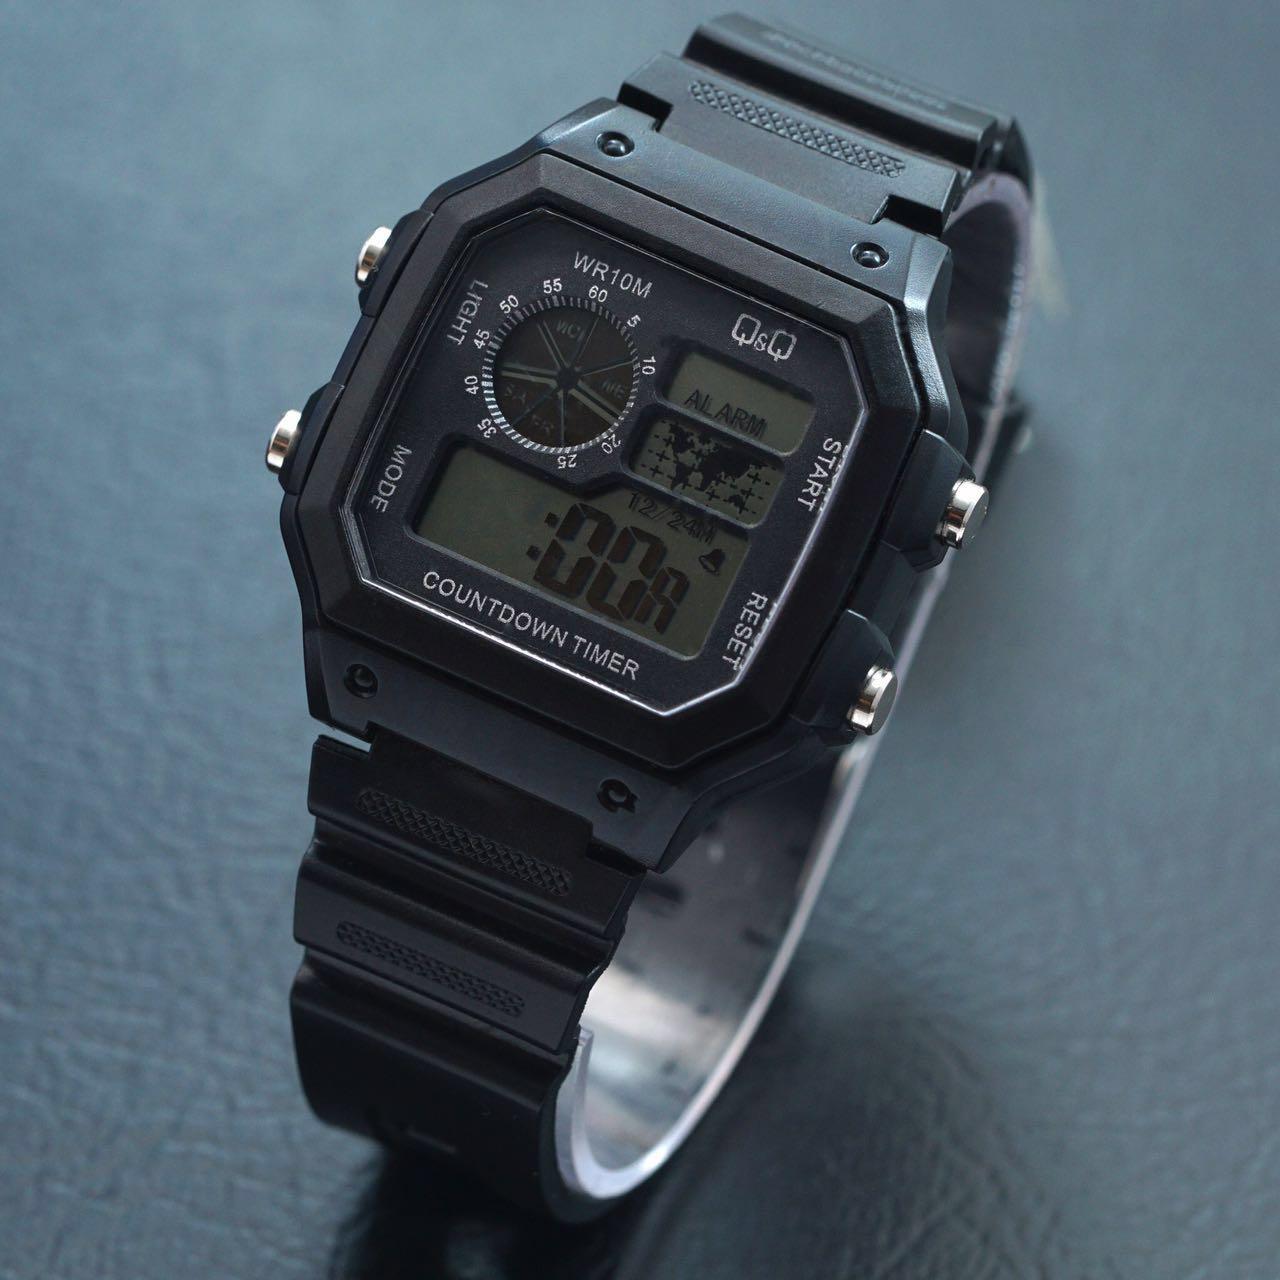 Casio Ae 1300wh 8a Jam Tangan Pria Rubber Strap Hitam7 Daftar Analog And Digital Watch Aq S810w 3av Hijau Ae1200 Hitam Page 2 Update Harga Terbaru